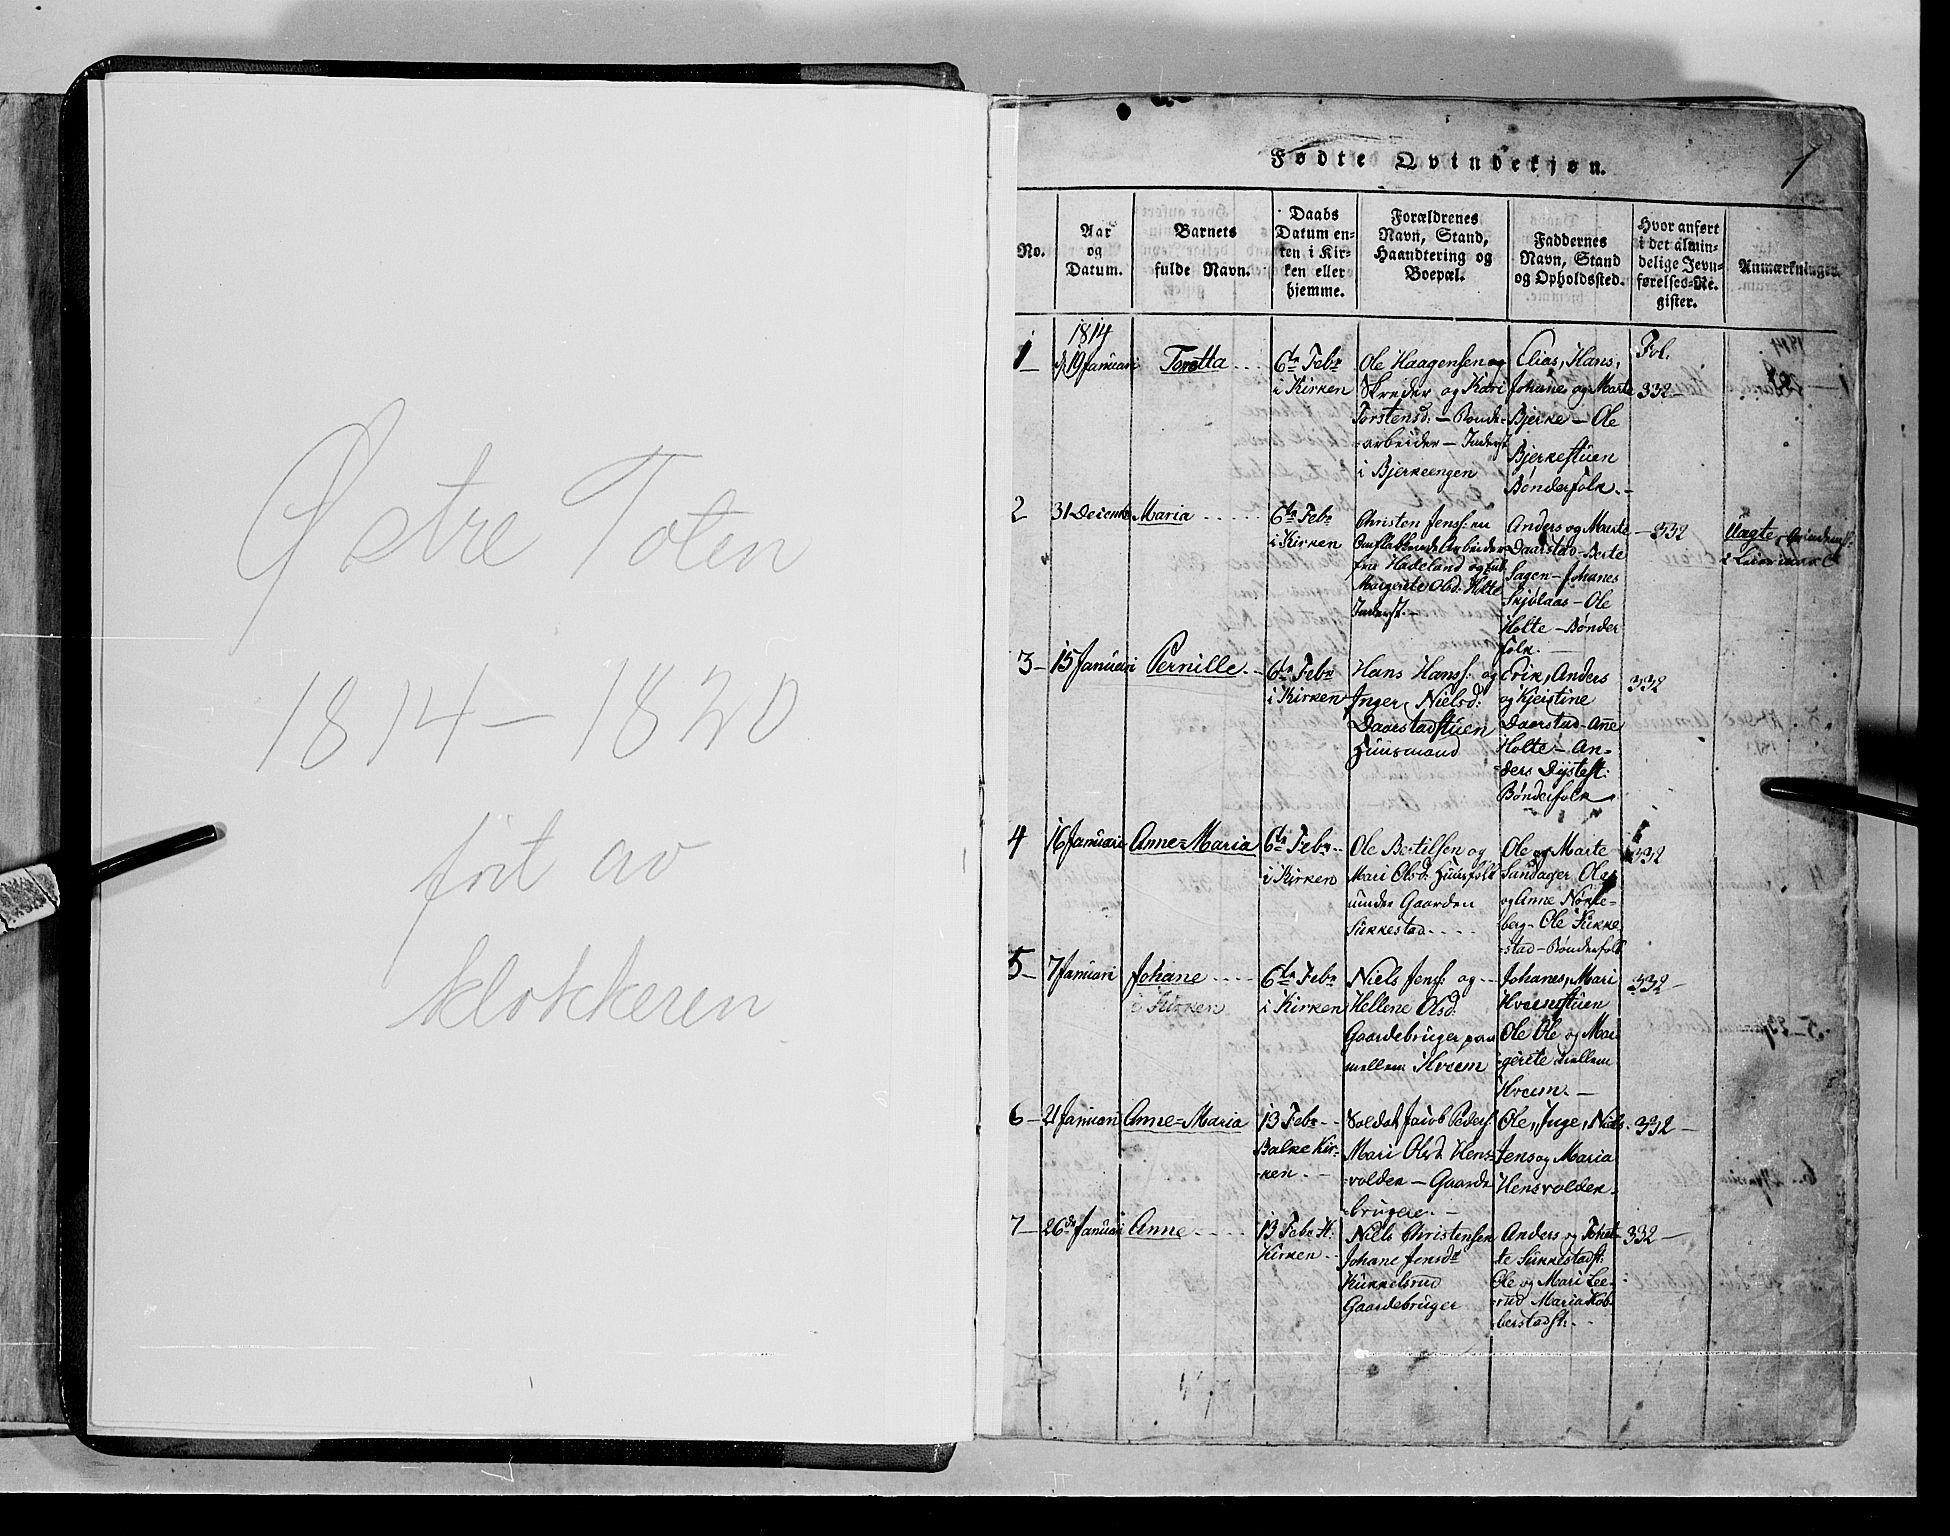 SAH, Toten prestekontor, Klokkerbok nr. 1, 1814-1820, s. 1